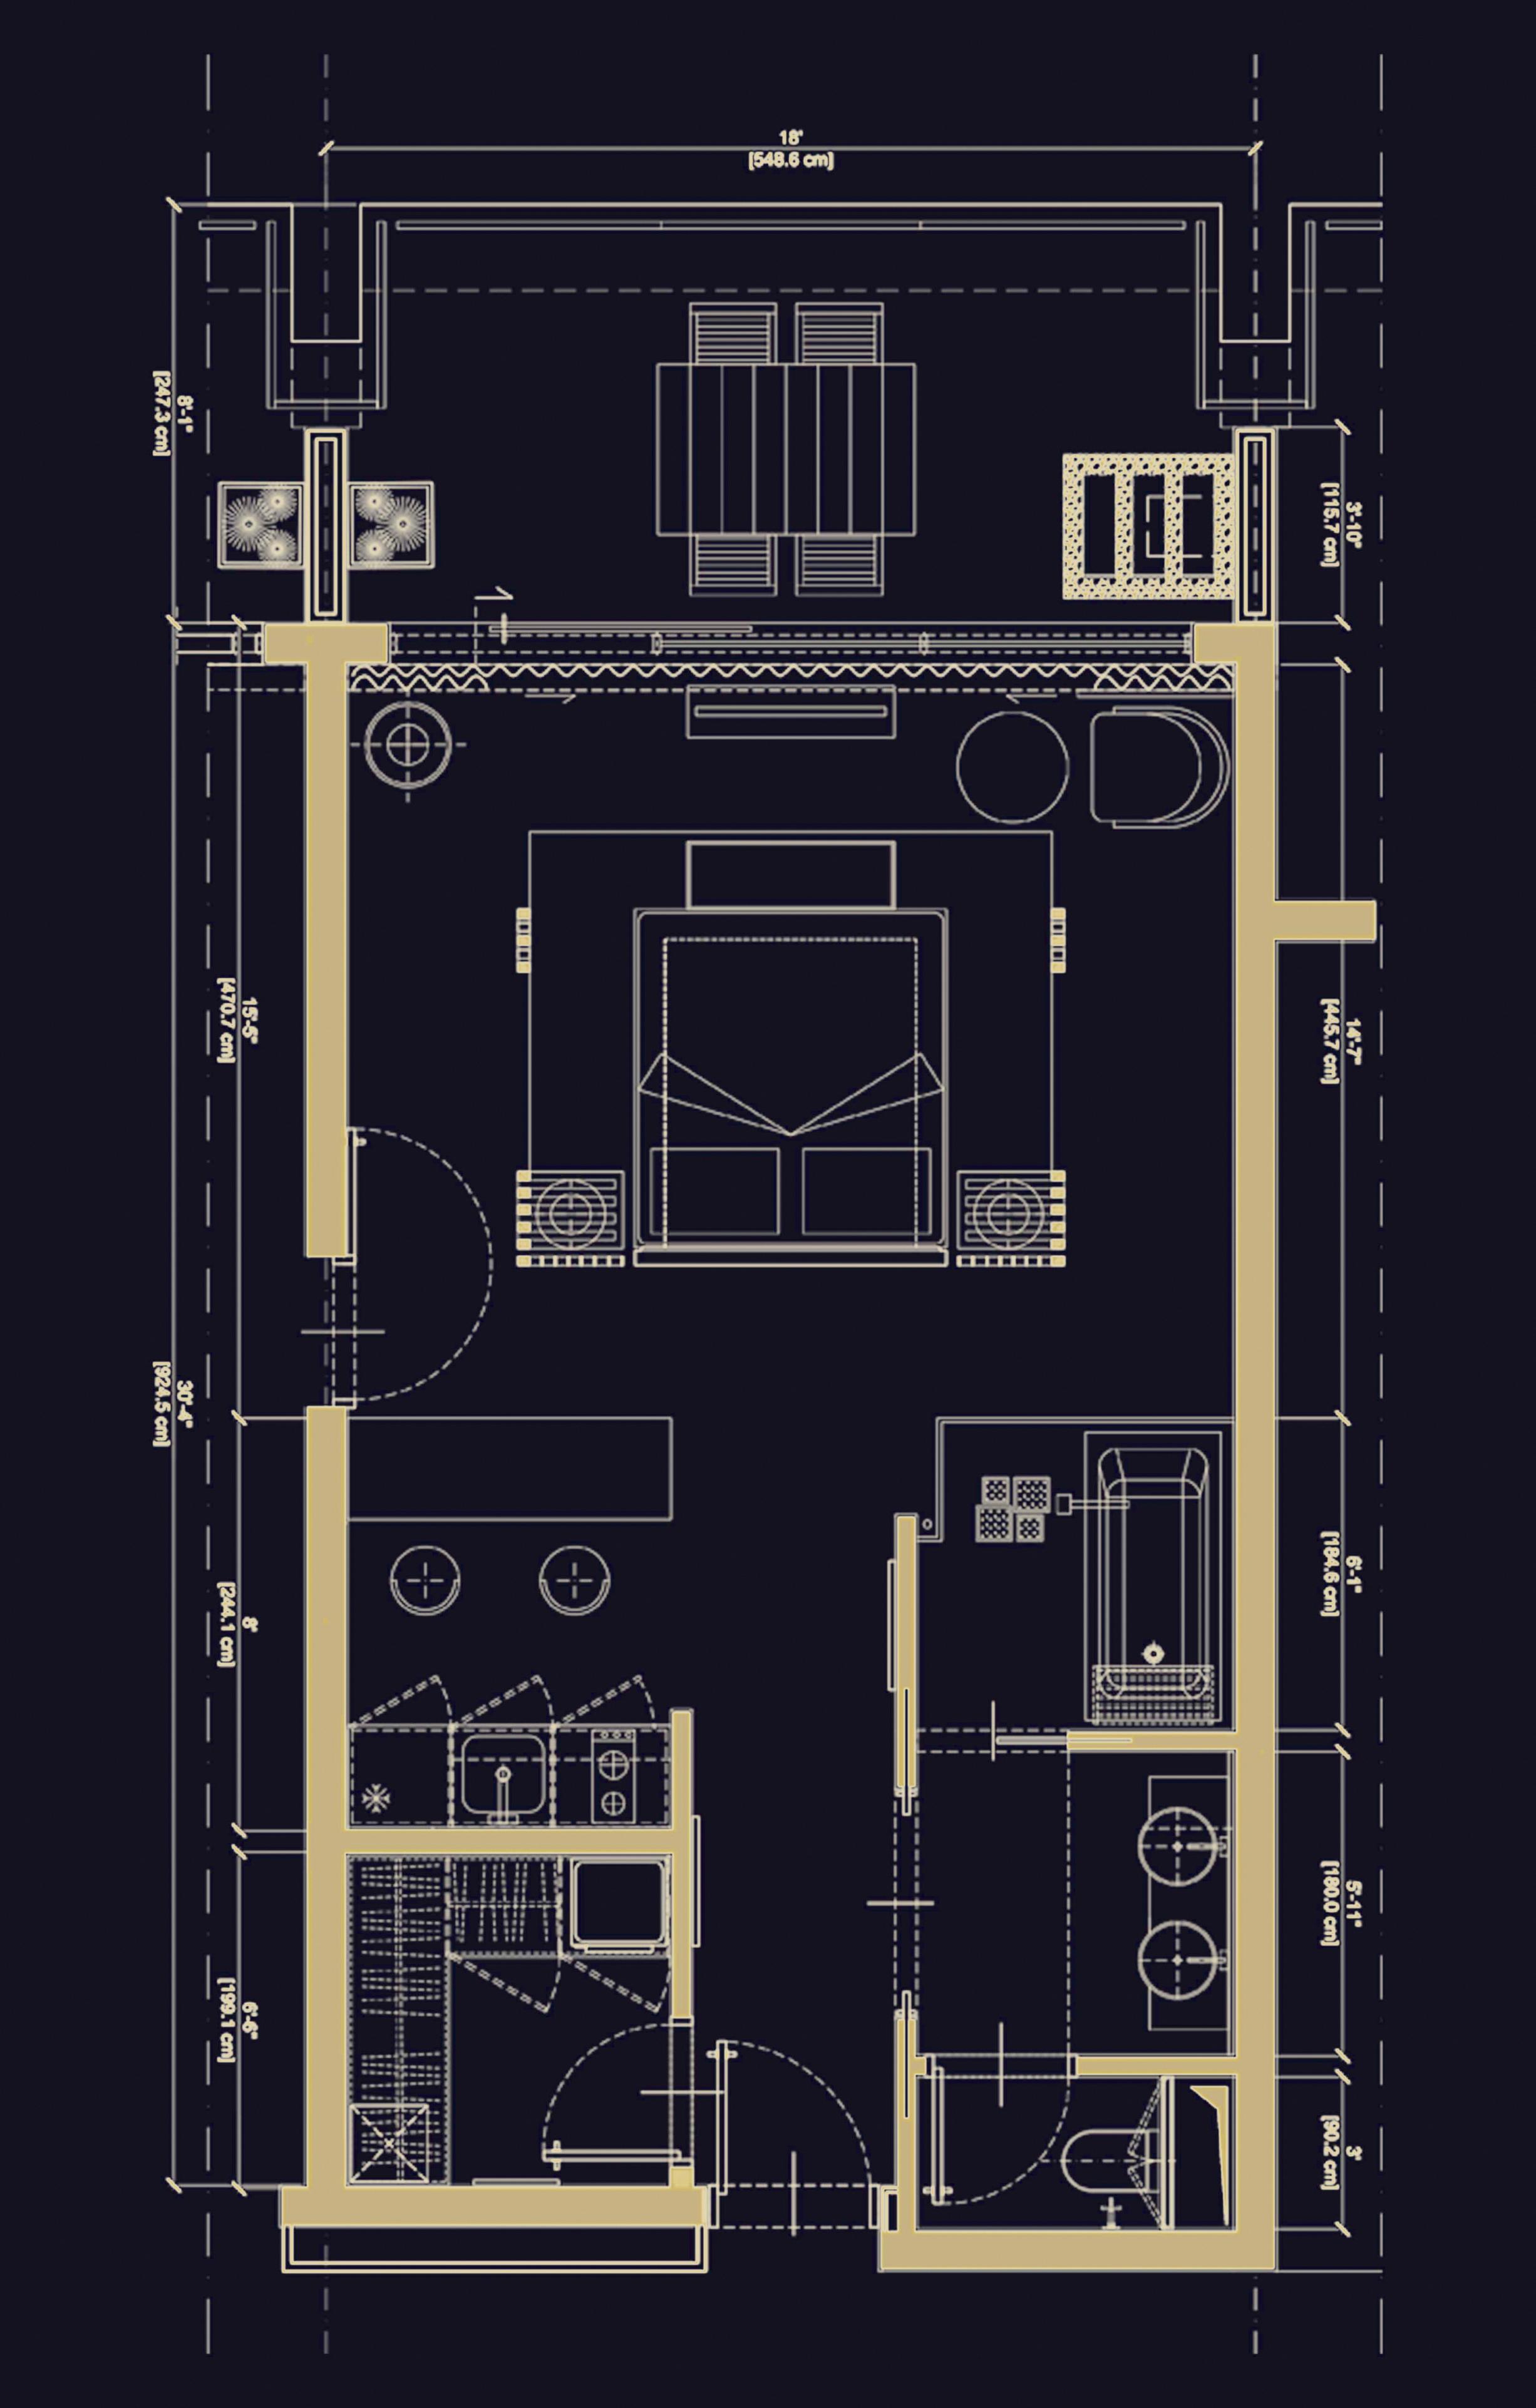 Ralph Lauren Closeout Bedding Key 5893340438 Hotel Floor Plan Hotel Room Design Hotel Plan